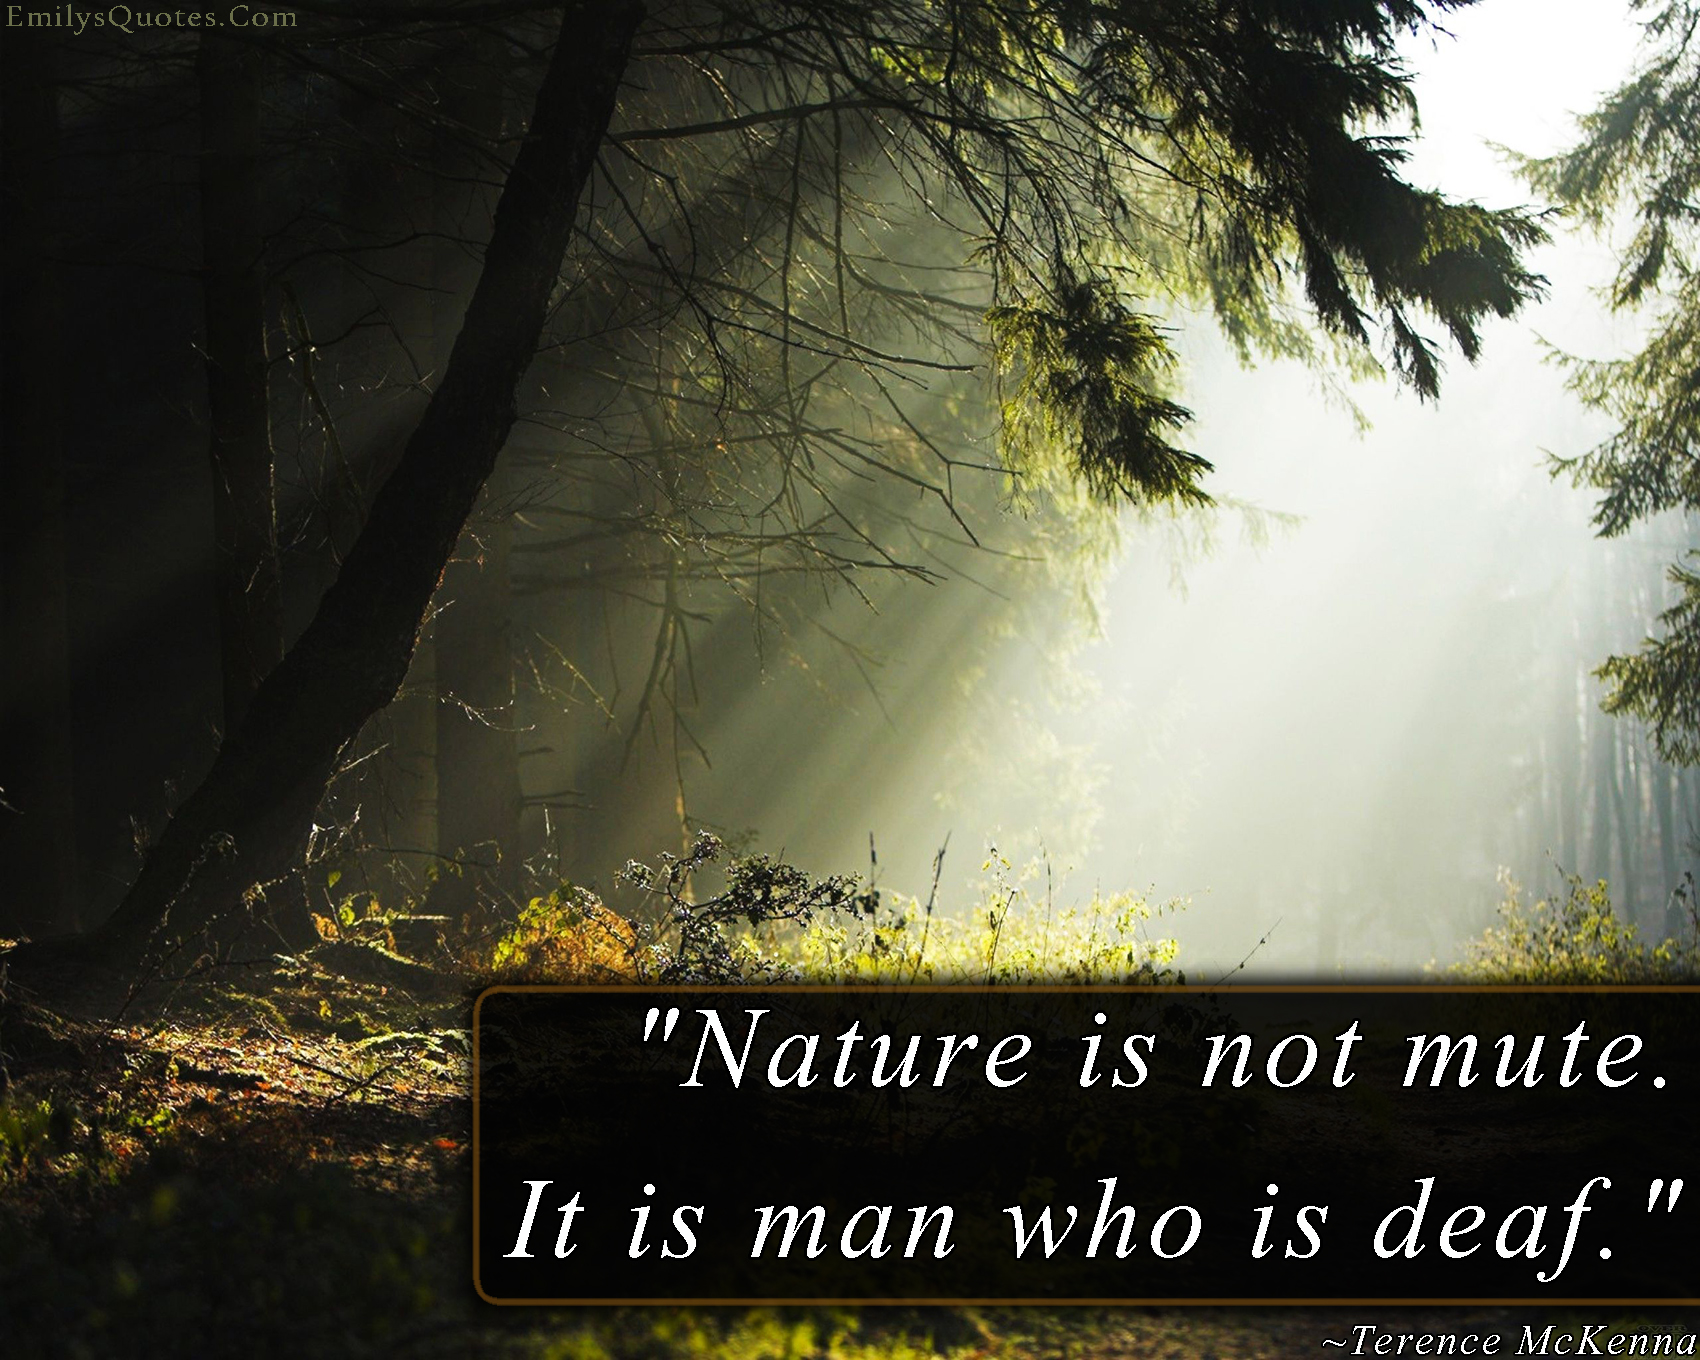 EmilysQuotes.Com - nature, people, ignorance, Terence McKenna, amazing, great